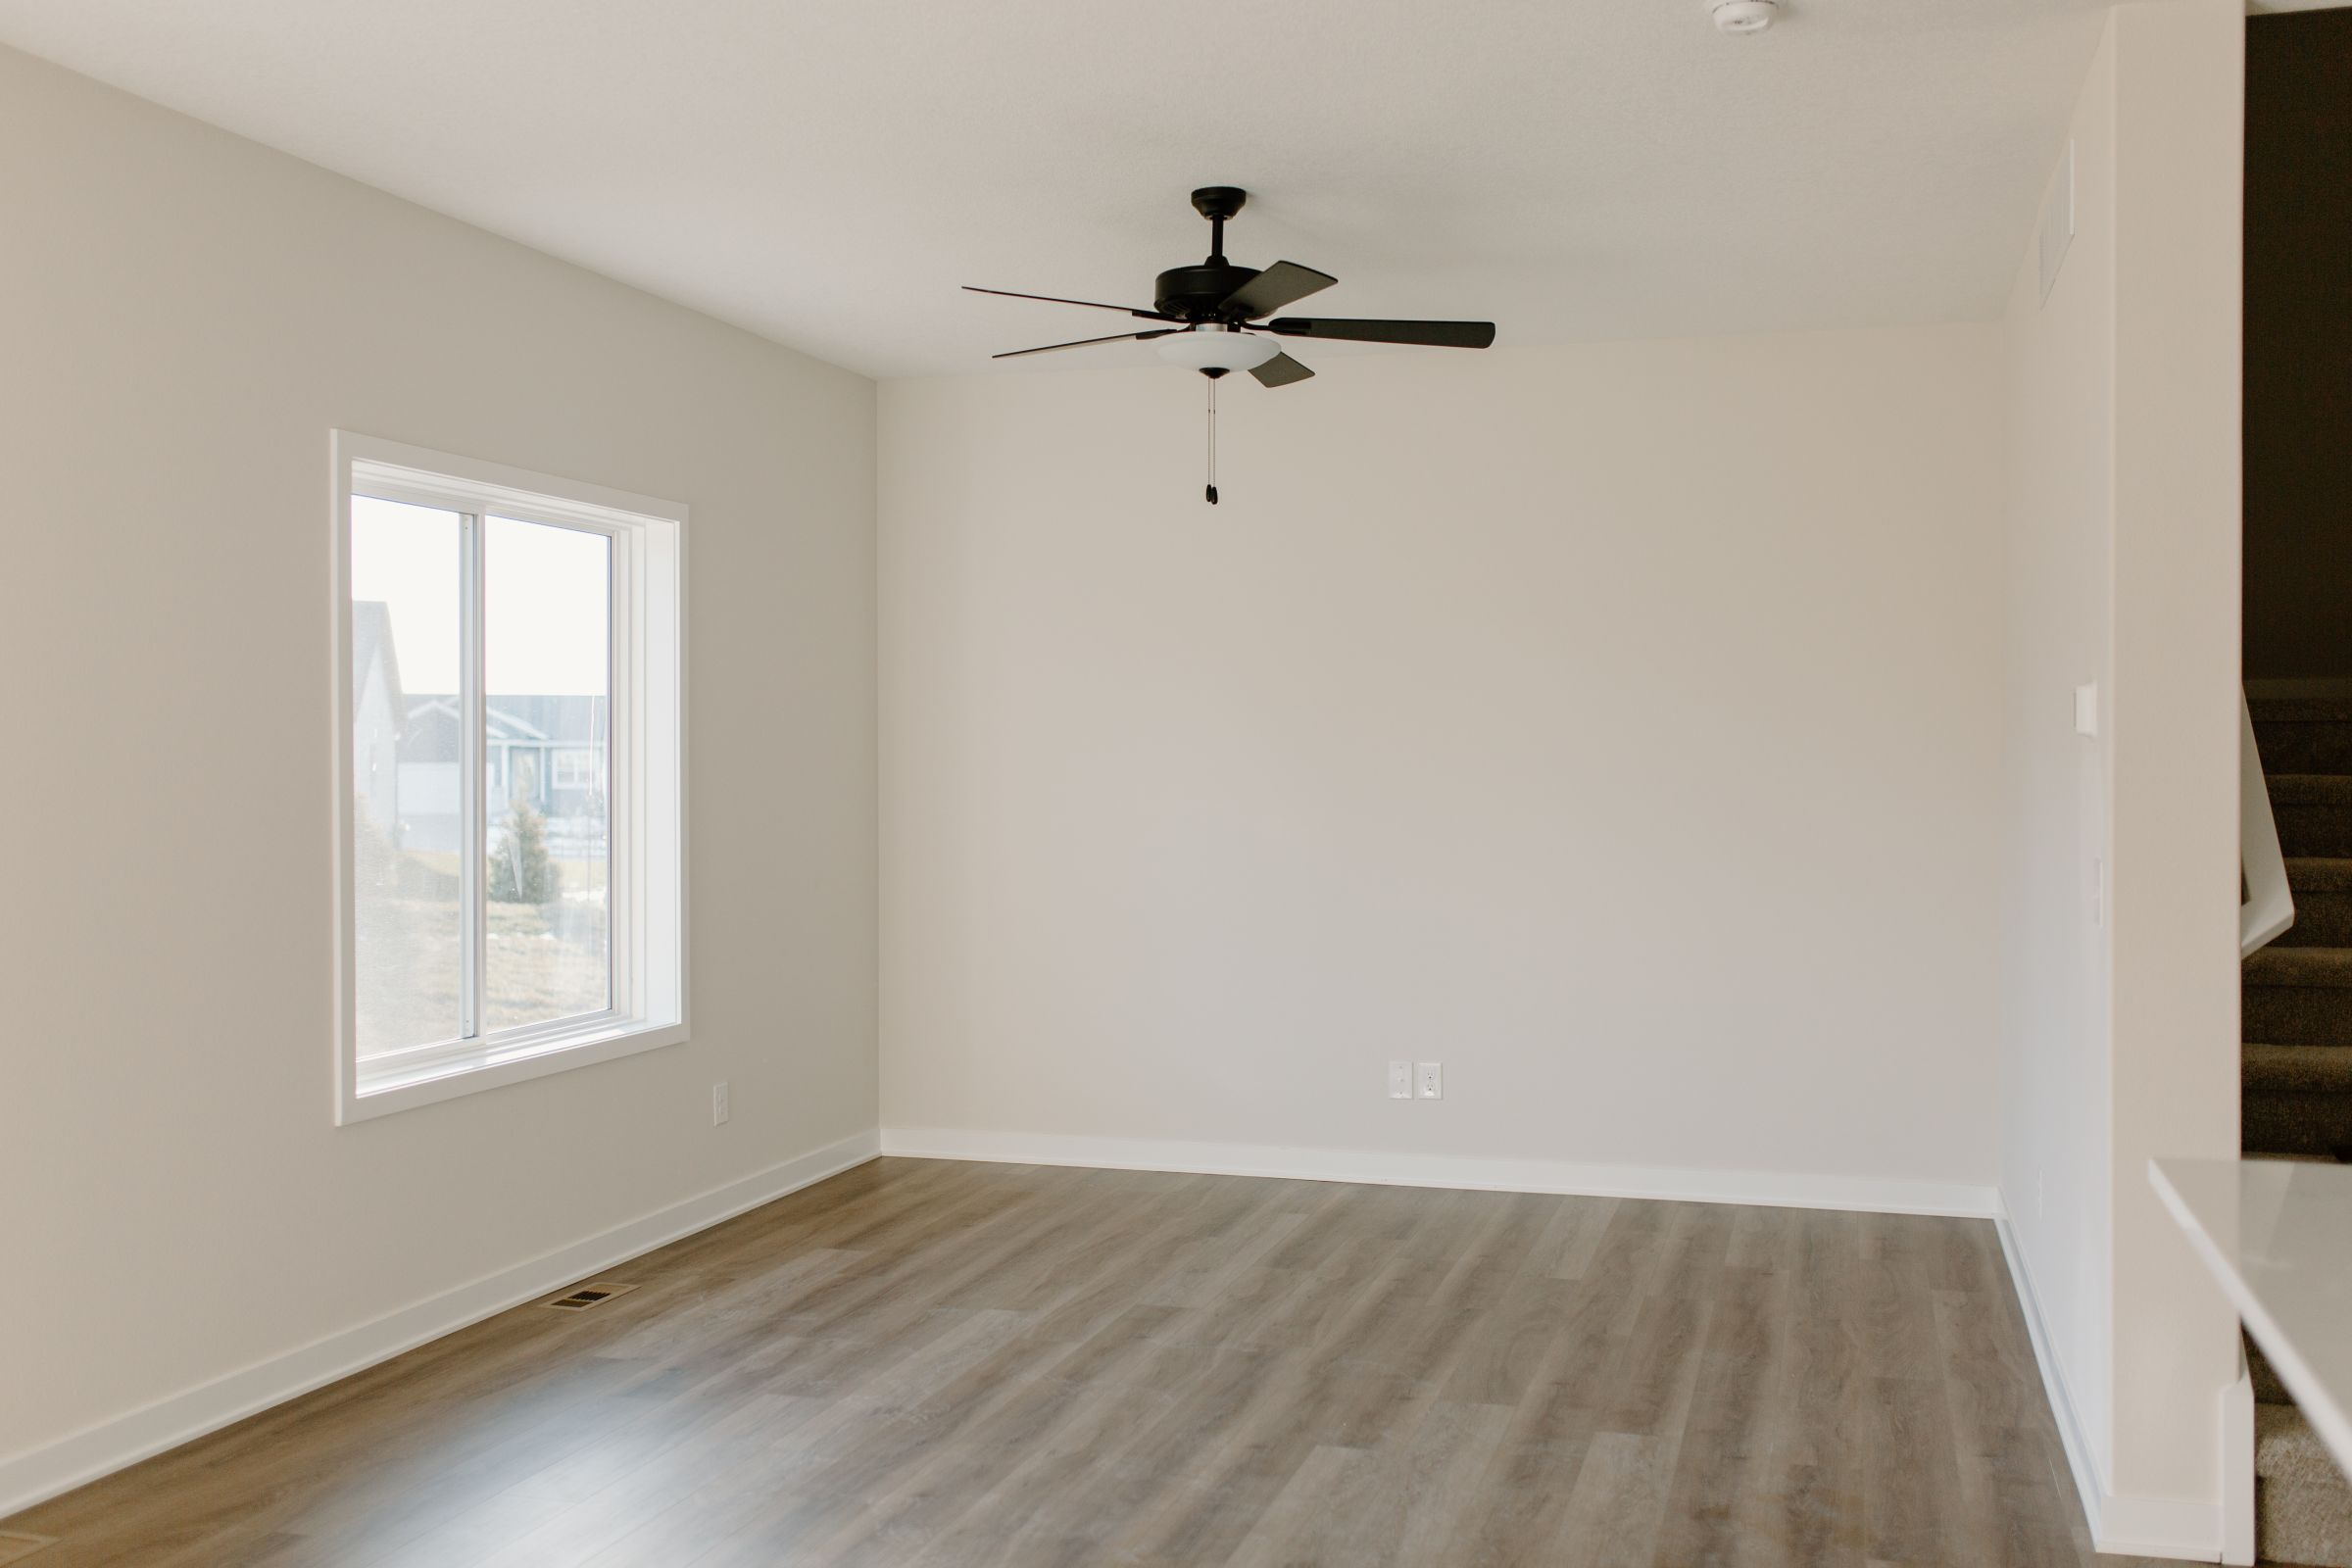 residential-warren-county-iowa-0-acres-listing-number-15138-6-2020-12-28-170551.jpg